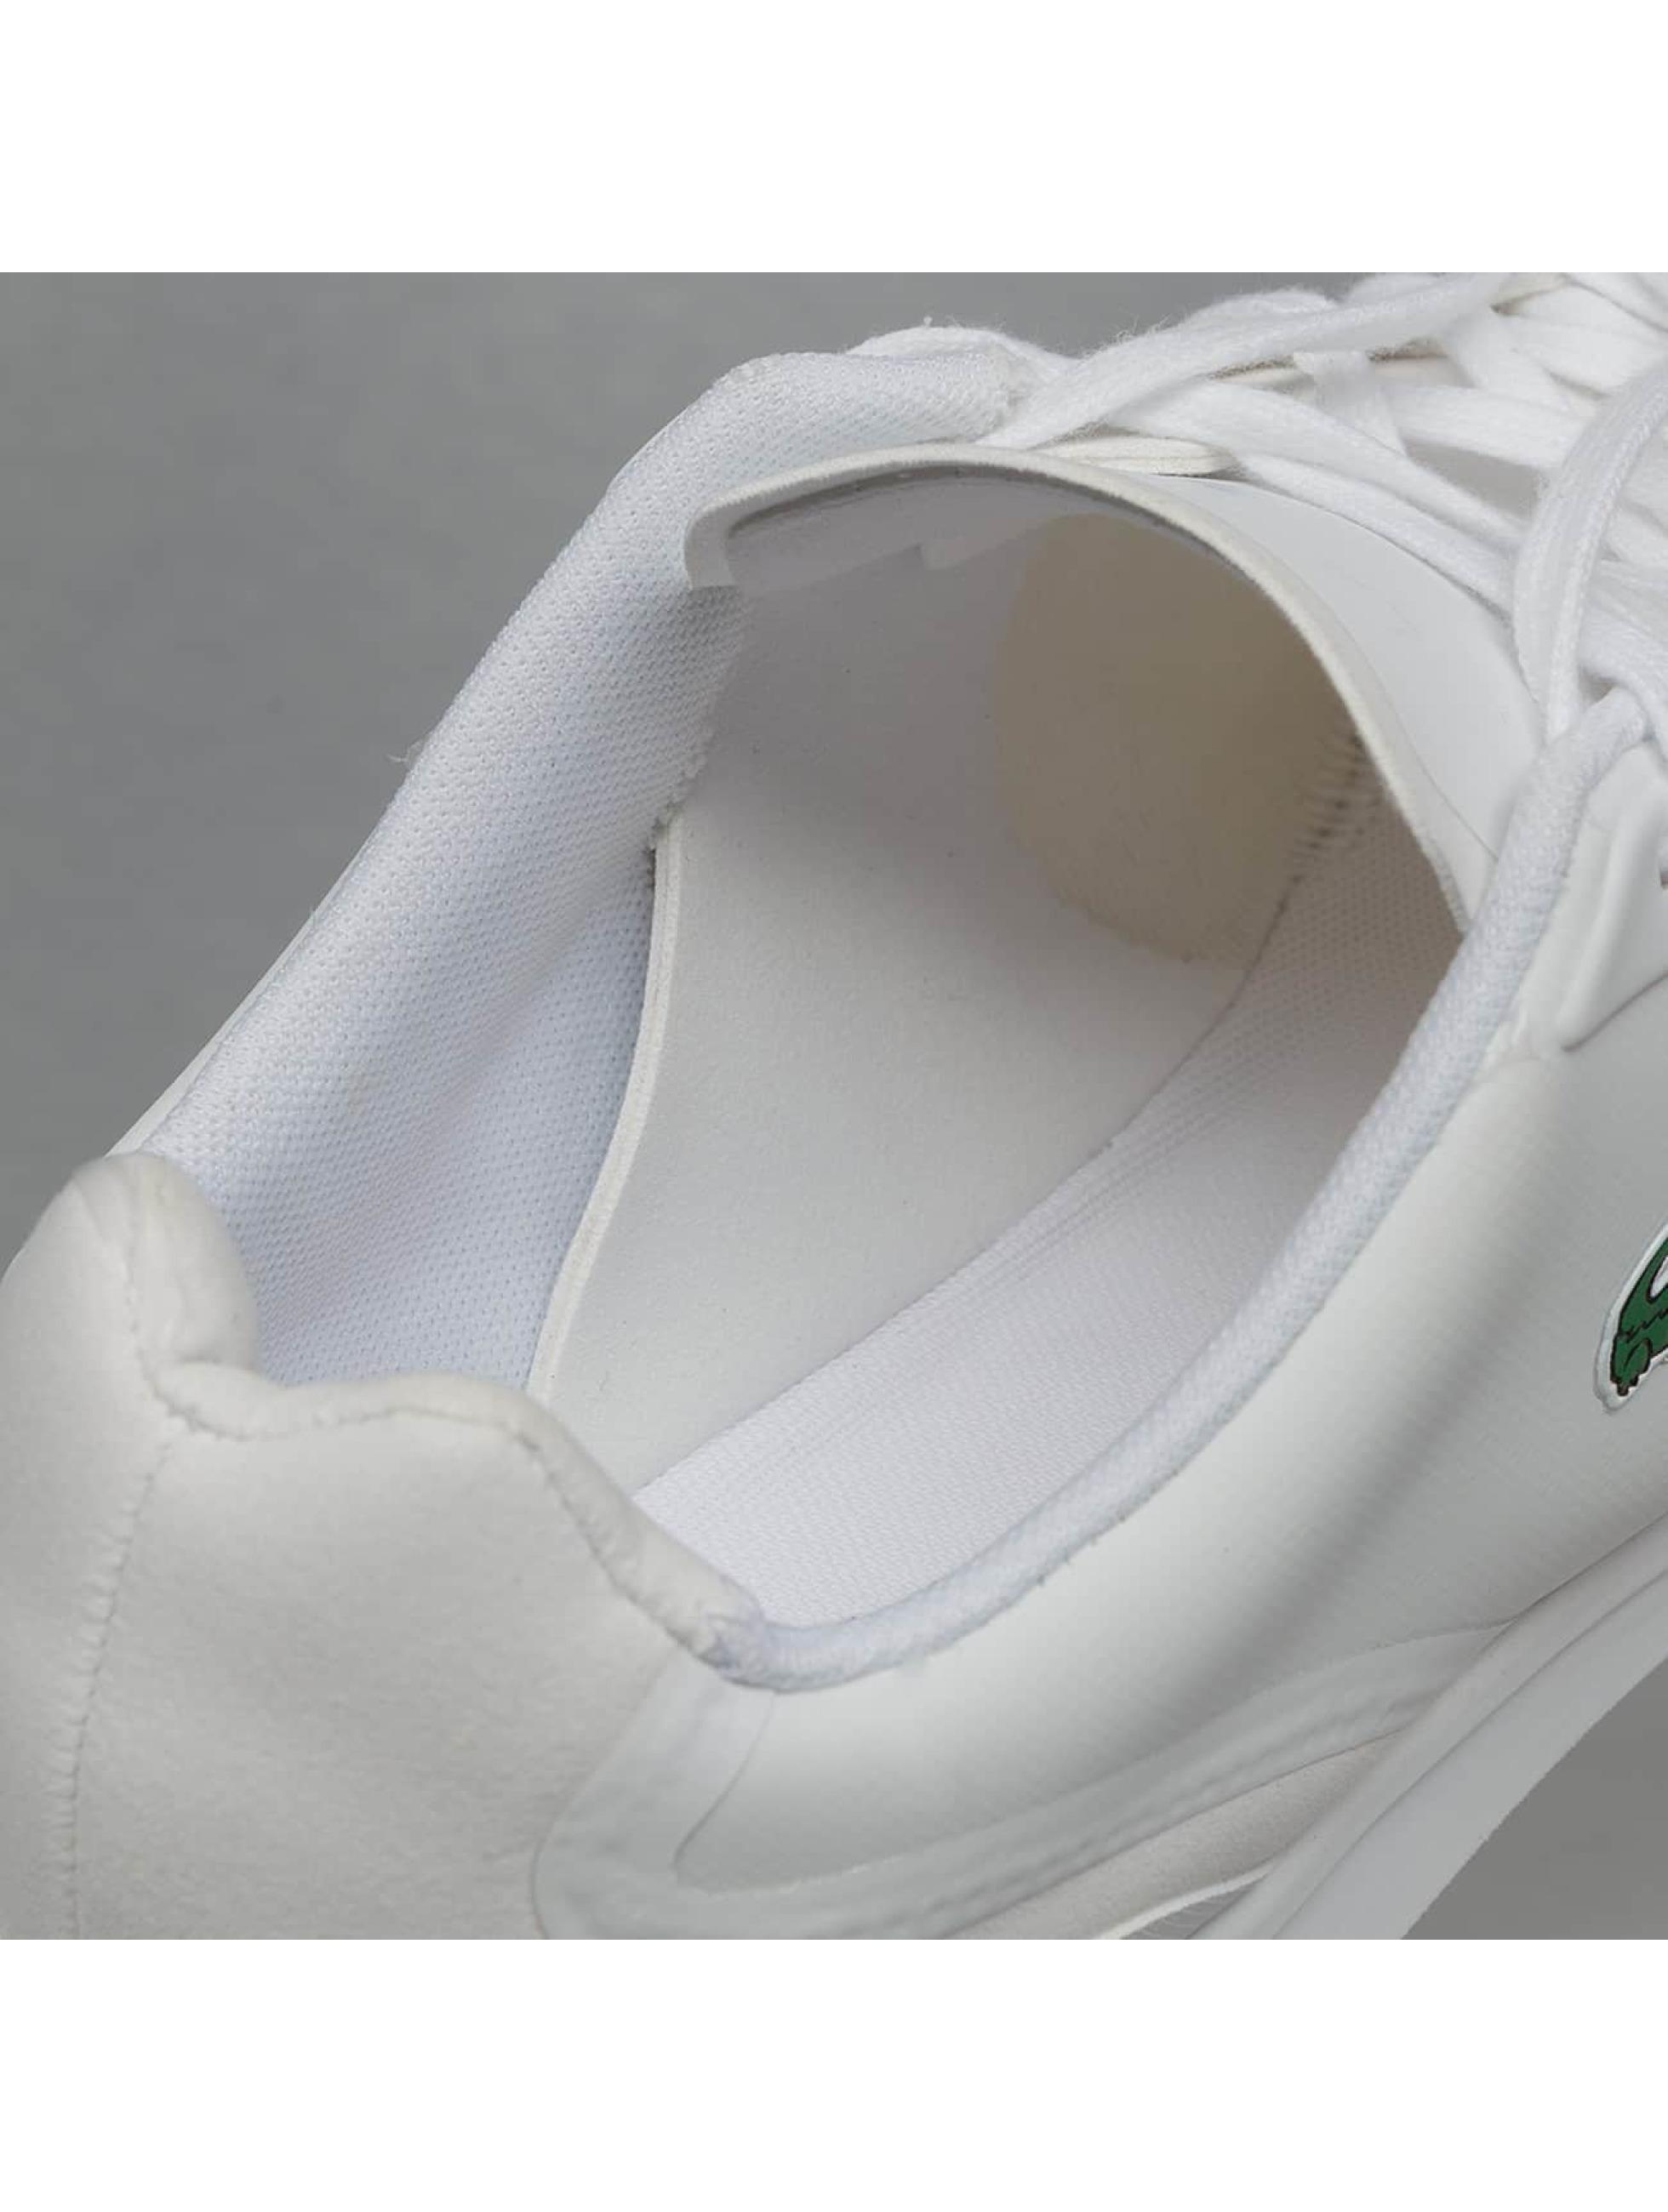 Lacoste Sneakers LTR.01 316 SPM white